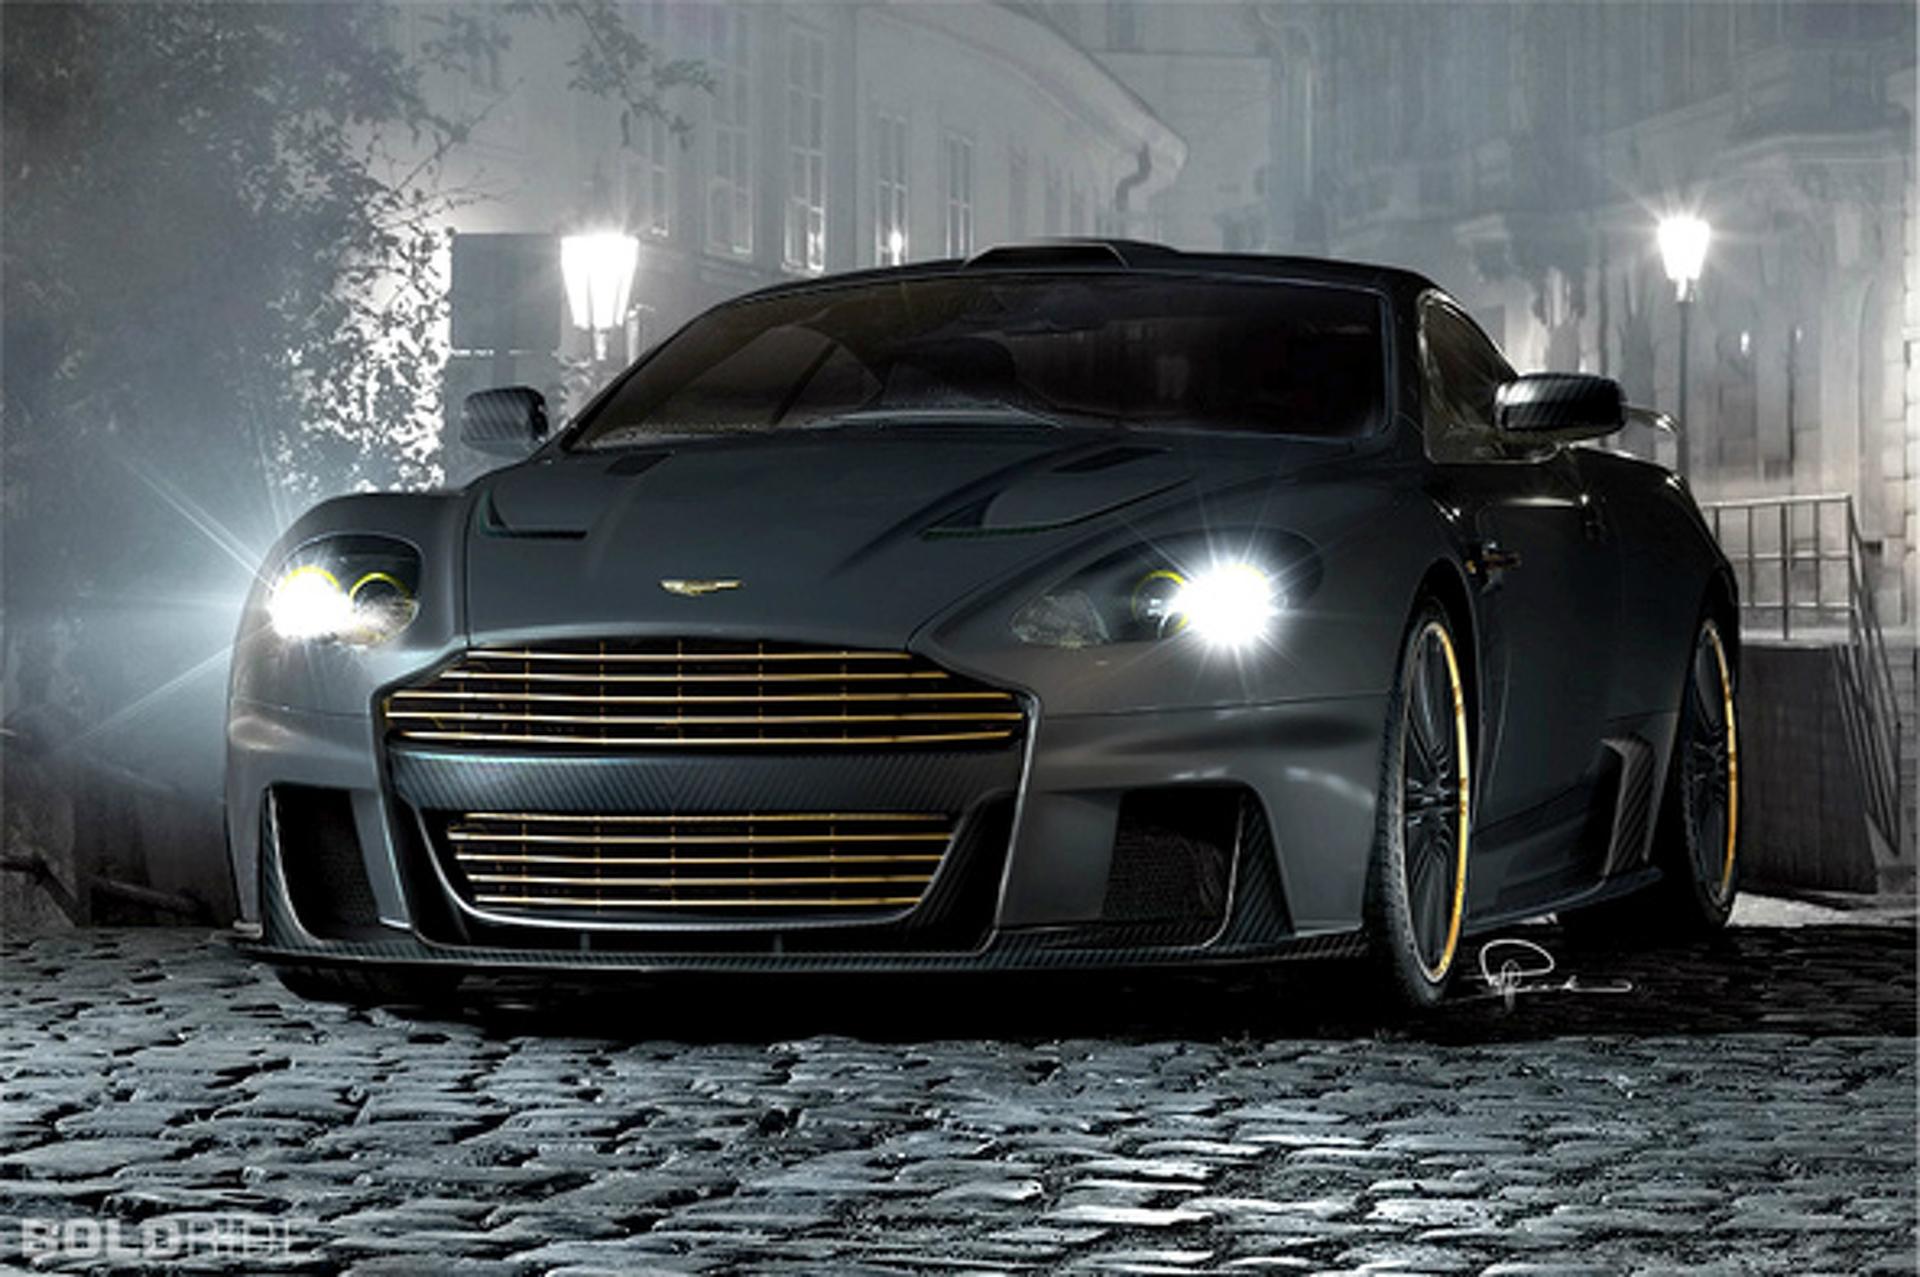 Most Popular: 2012 DMC Aston Martin DBS Fakhuna